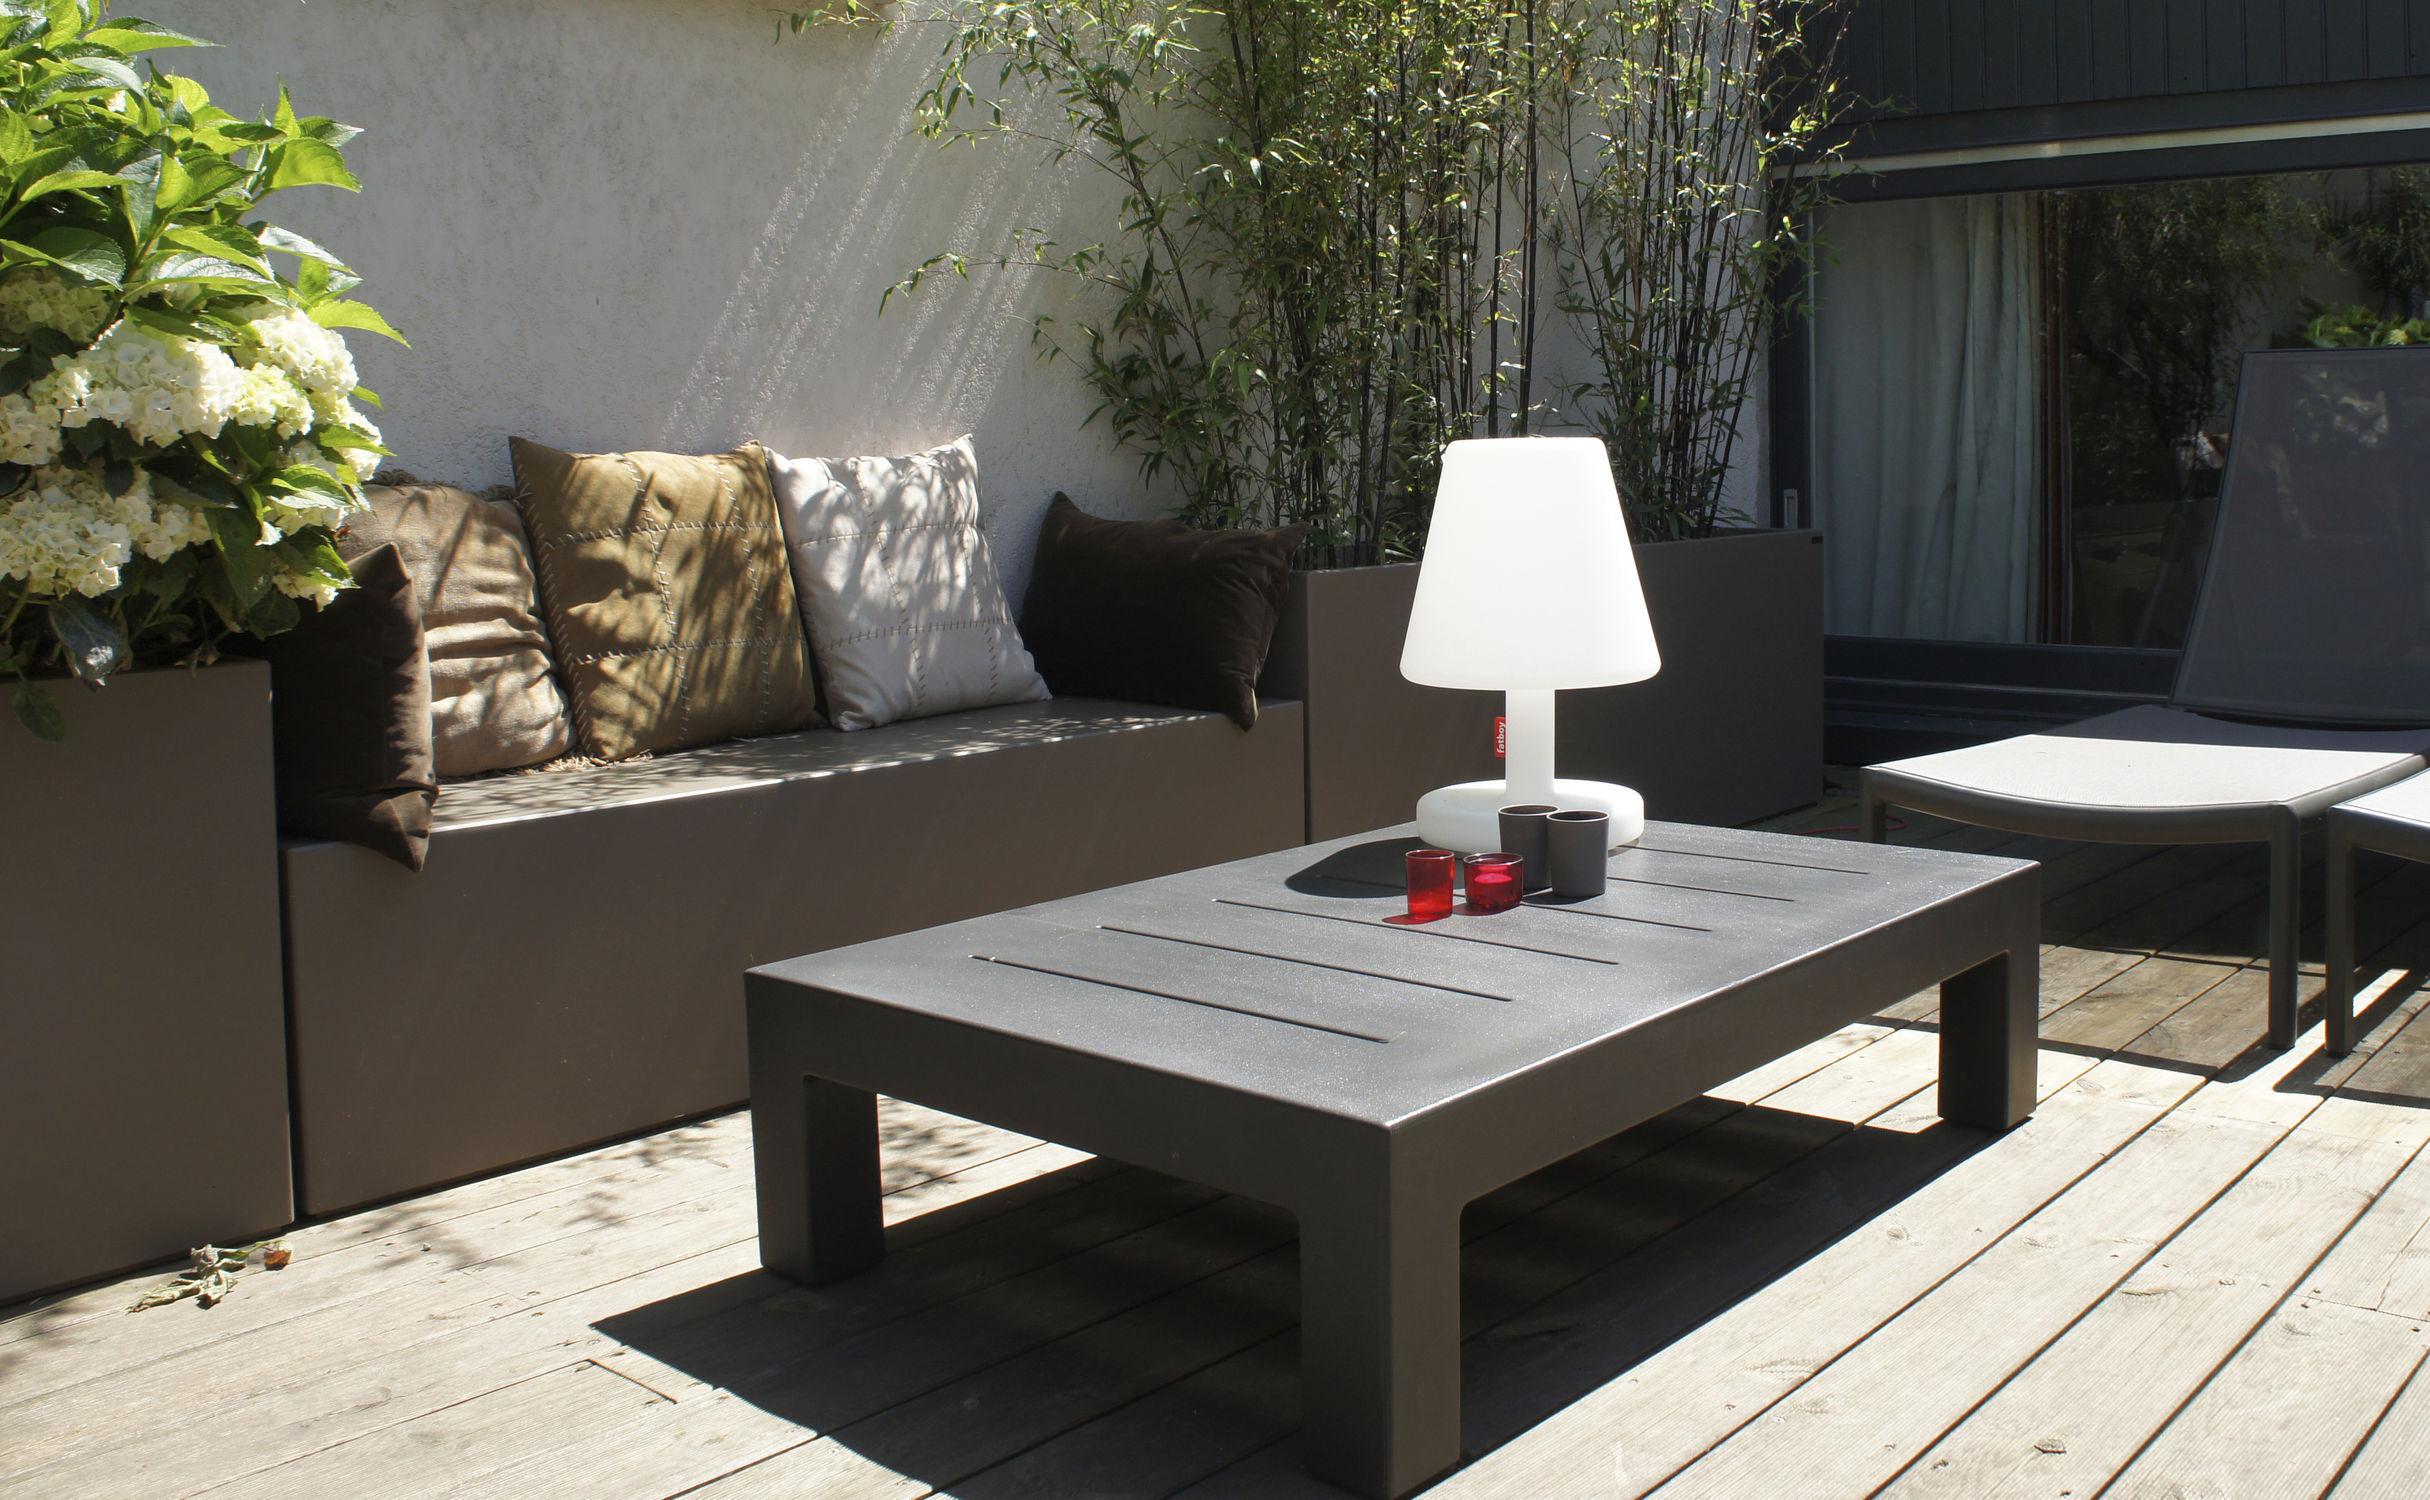 jardinera de rectangular moderna para espacio pblico icchirmh